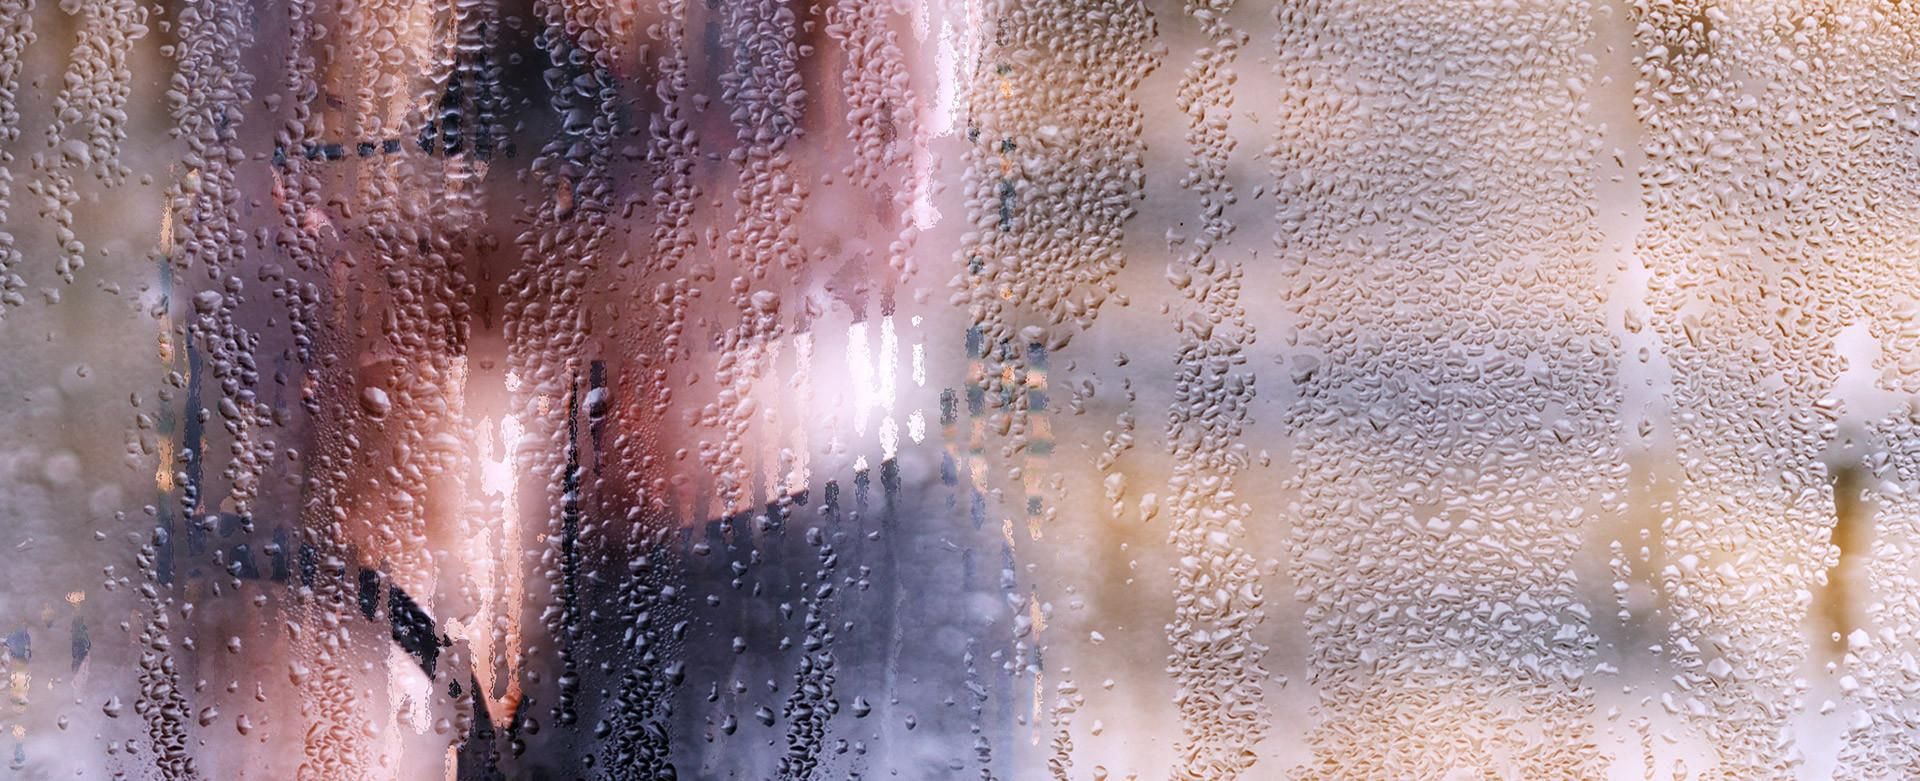 Couple in embrace behind a shower door